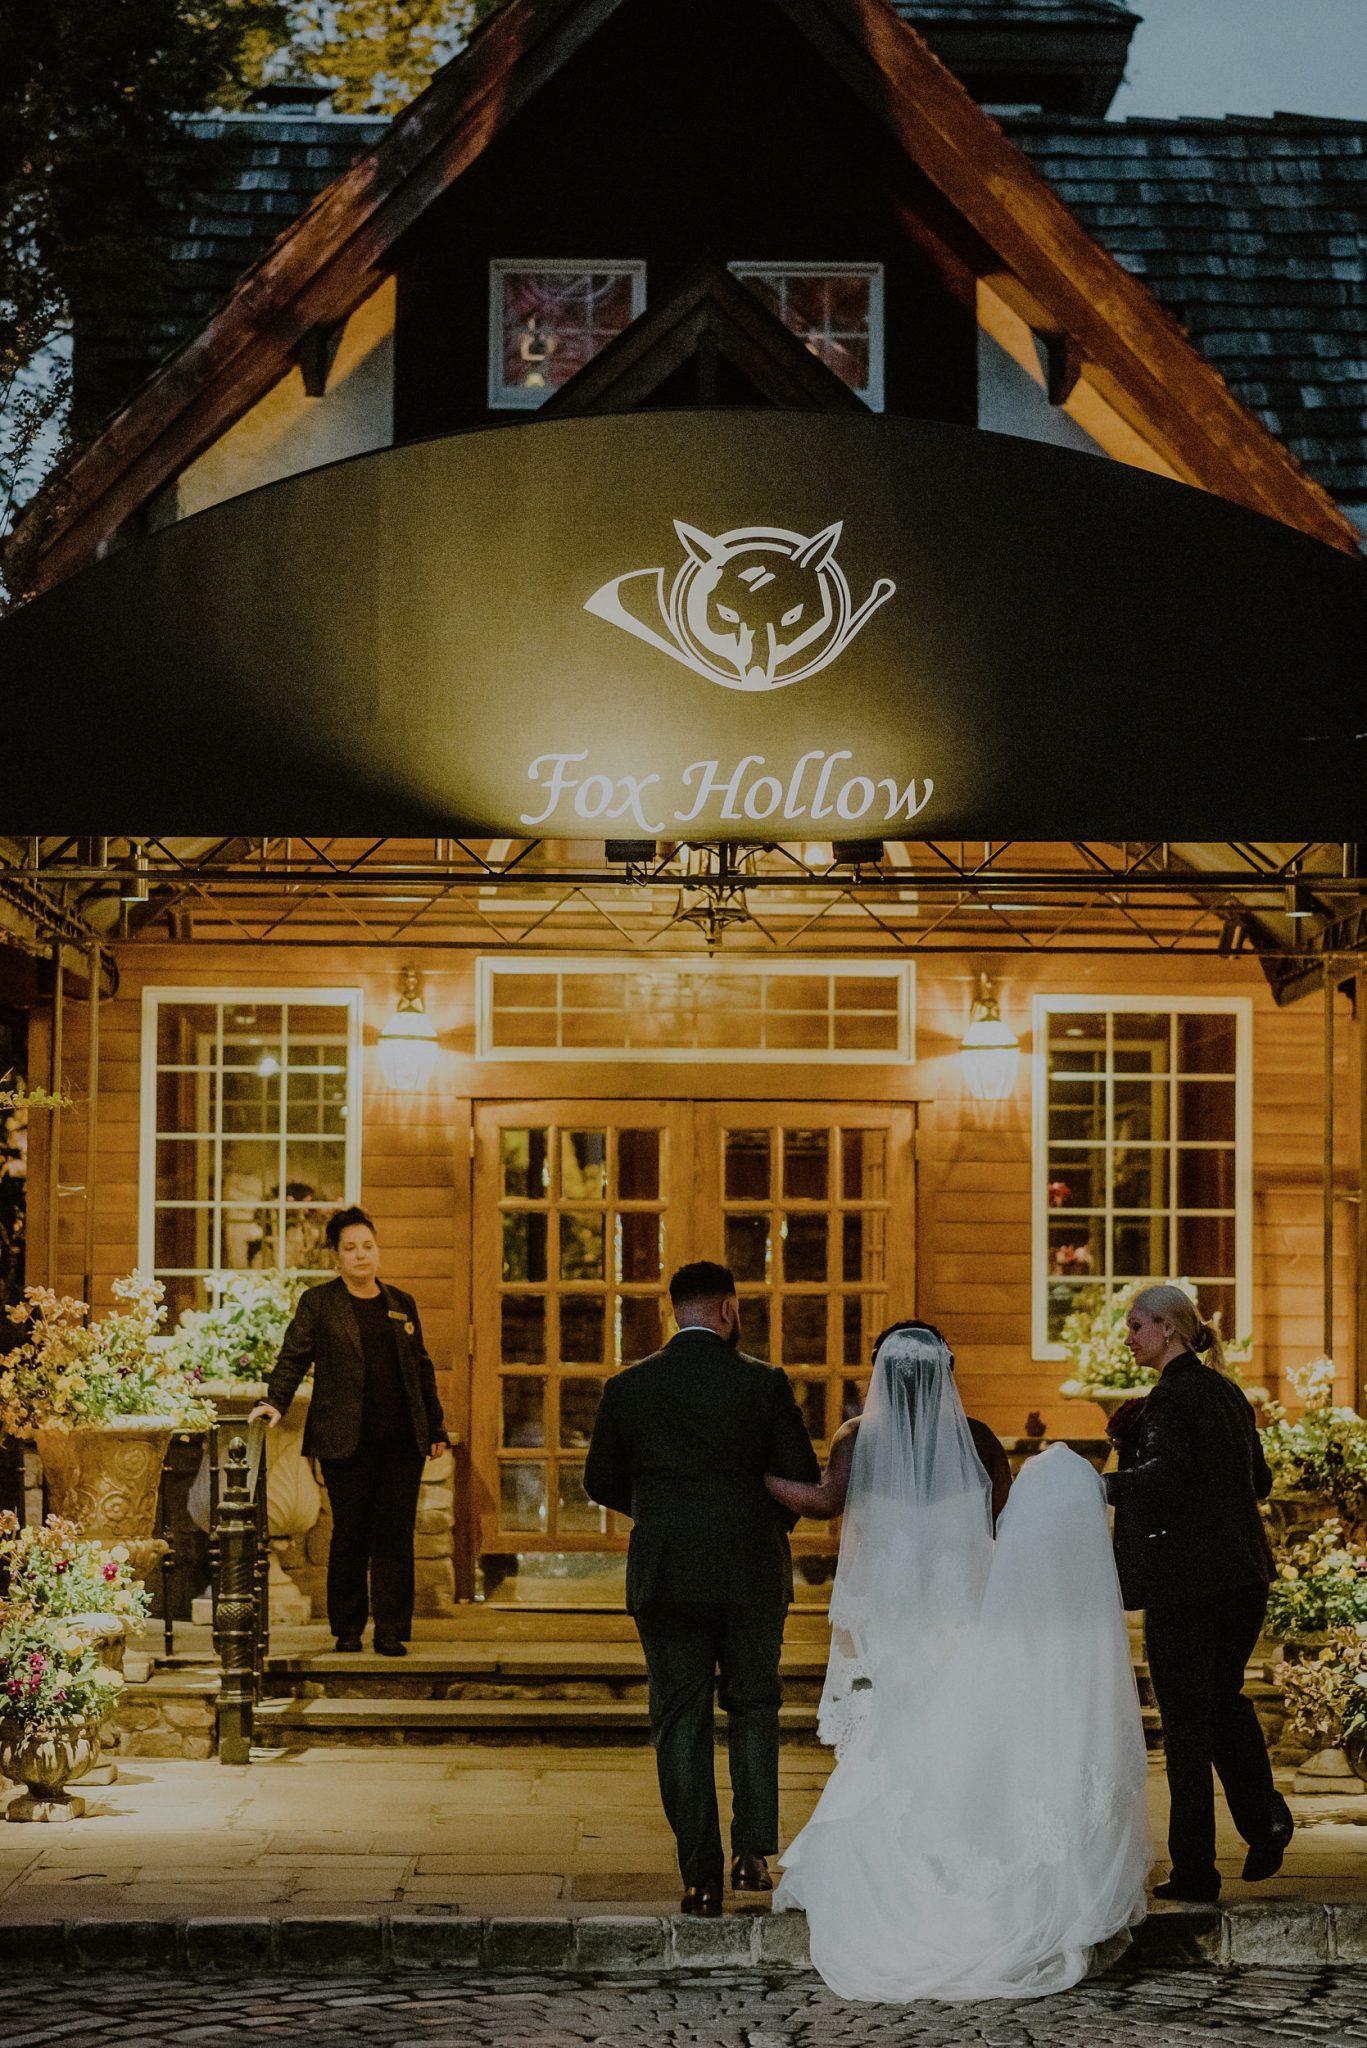 fox hollow wedding entrance in woodbury ny